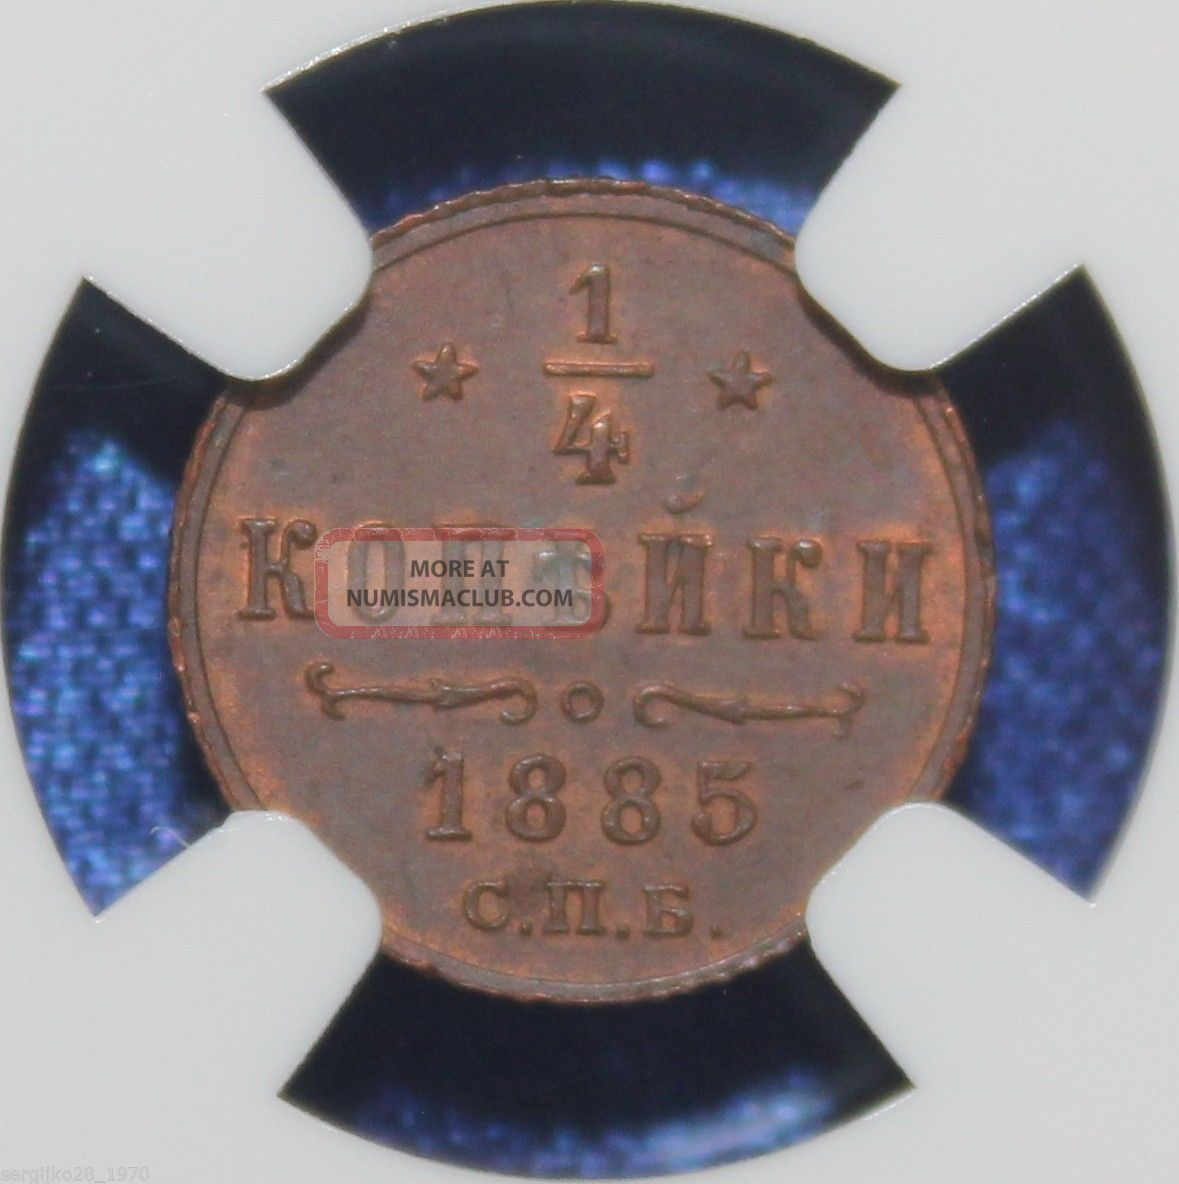 Russia 1/4 Kopek 1885cnb Ngc Ms62bn Coin Russia photo